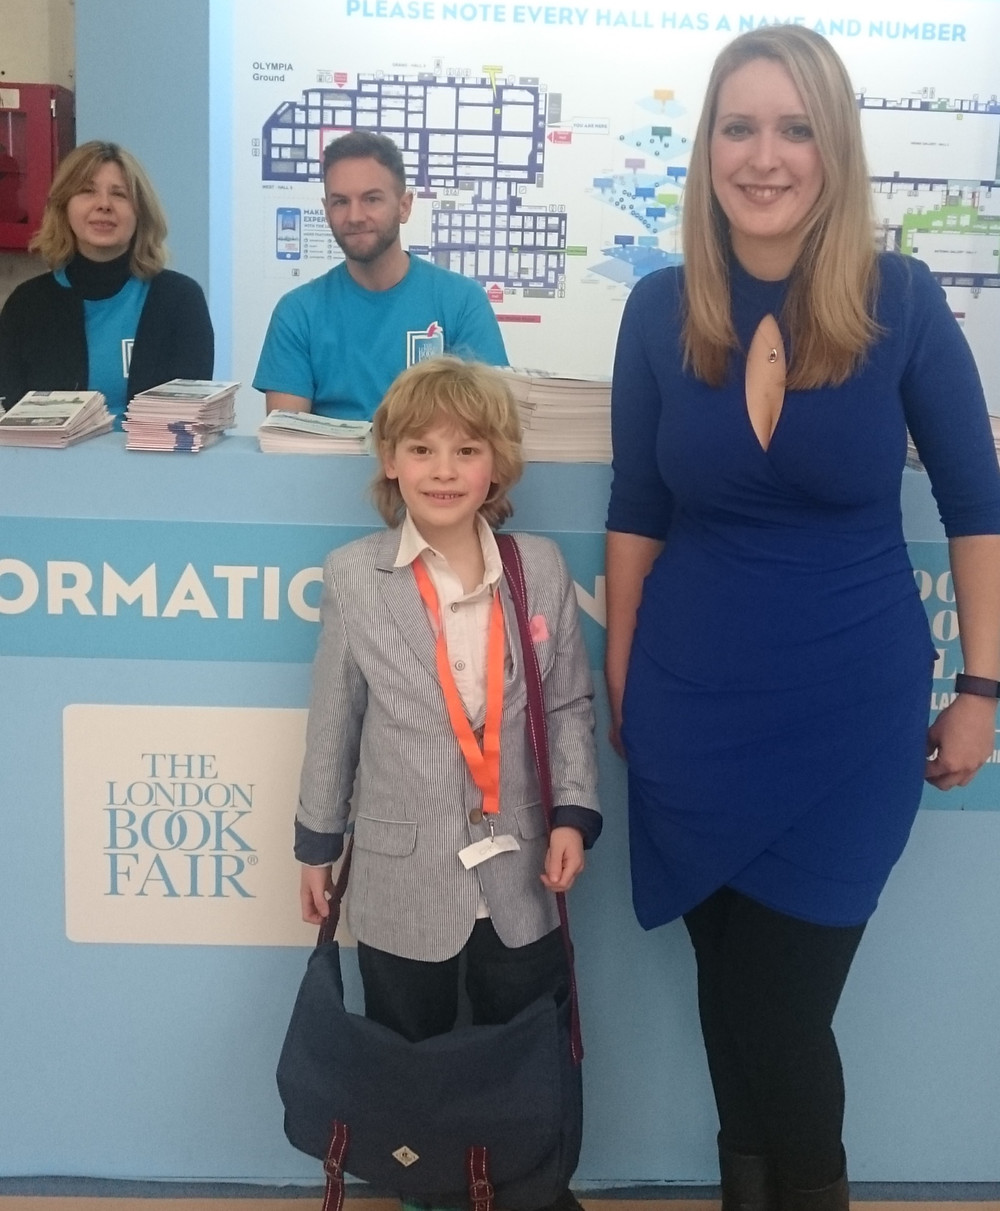 Danielle and Nathan at the London Book Fair